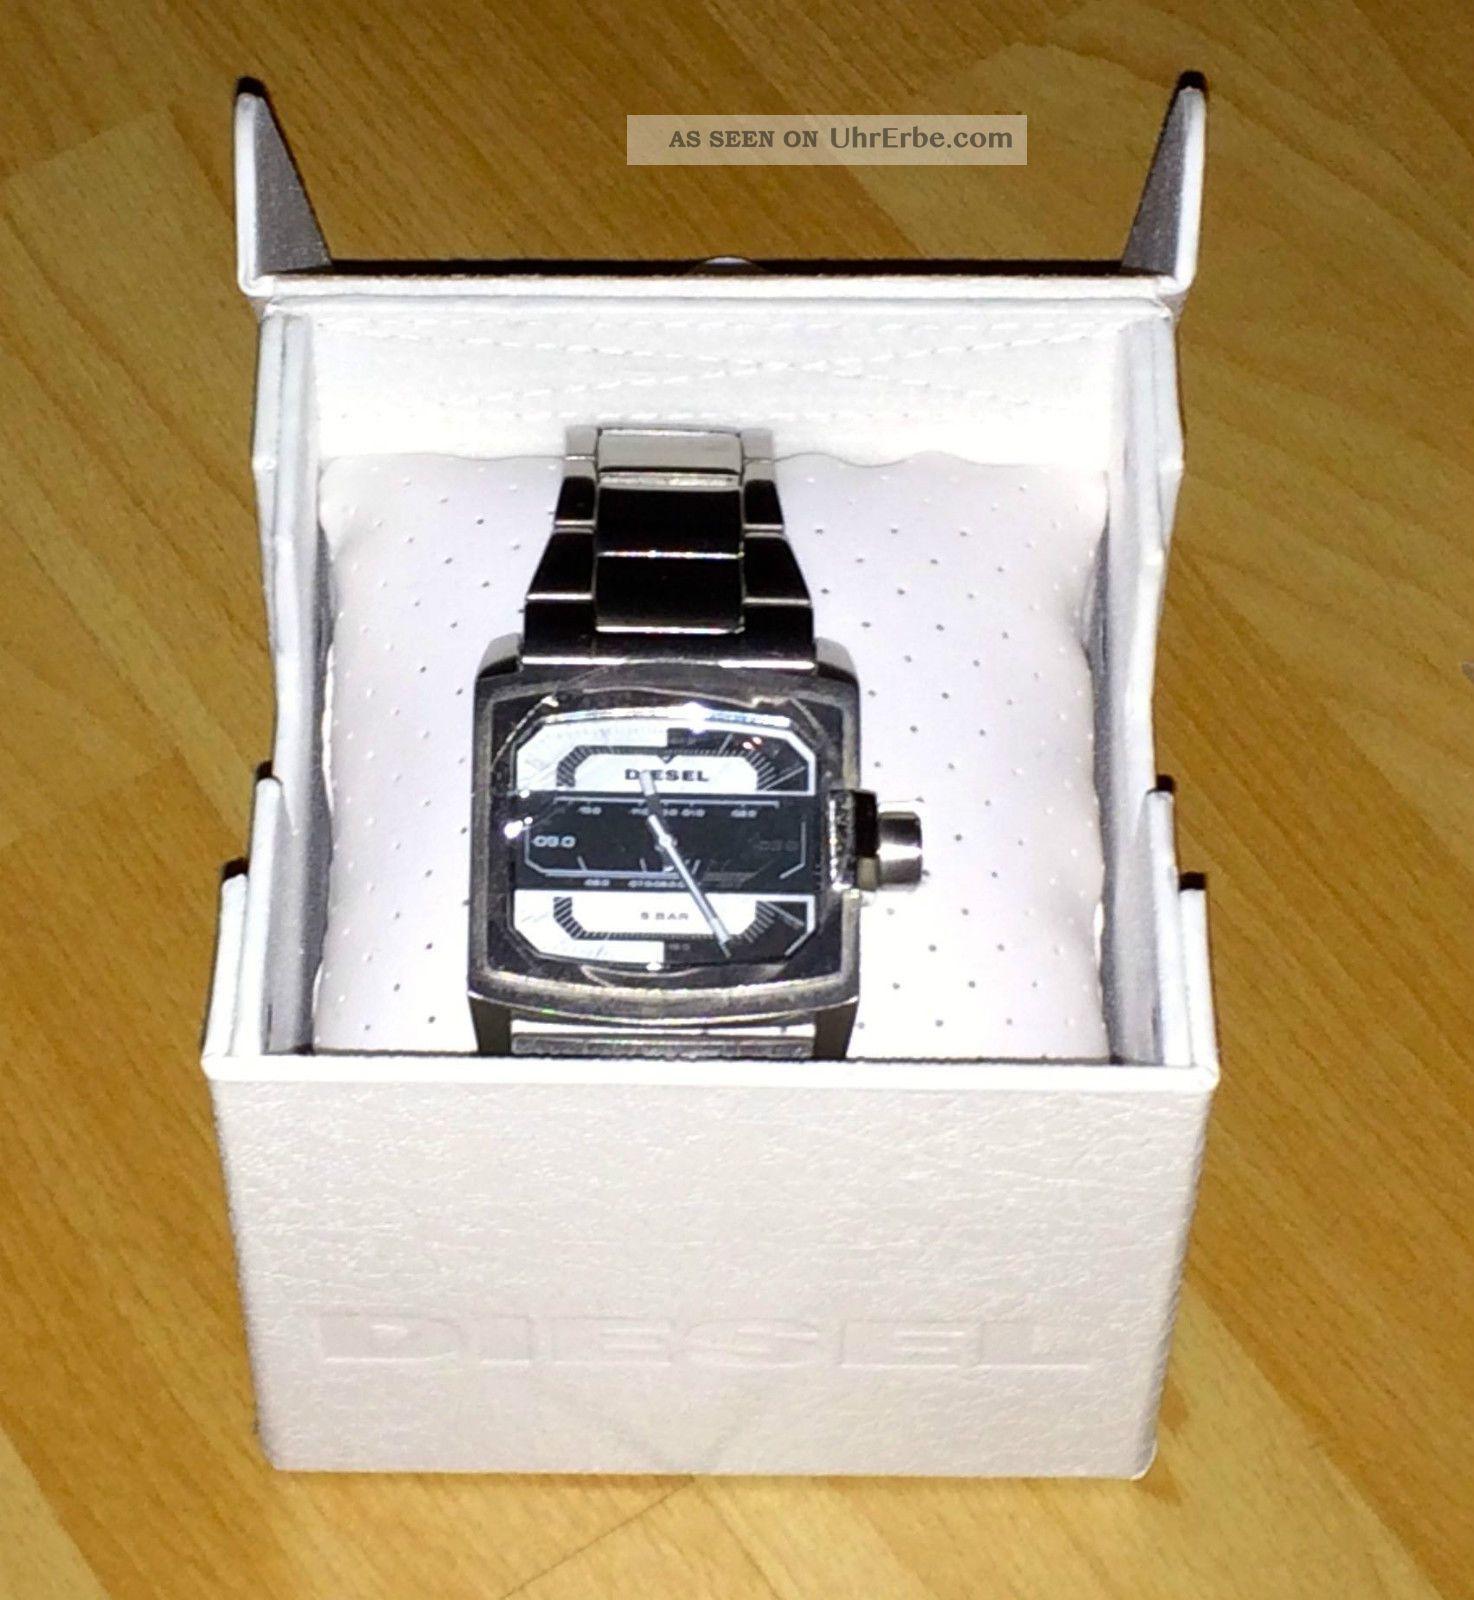 Diesel Armbanduhr Silber Metallarmband Rechteckig Armbanduhren Bild